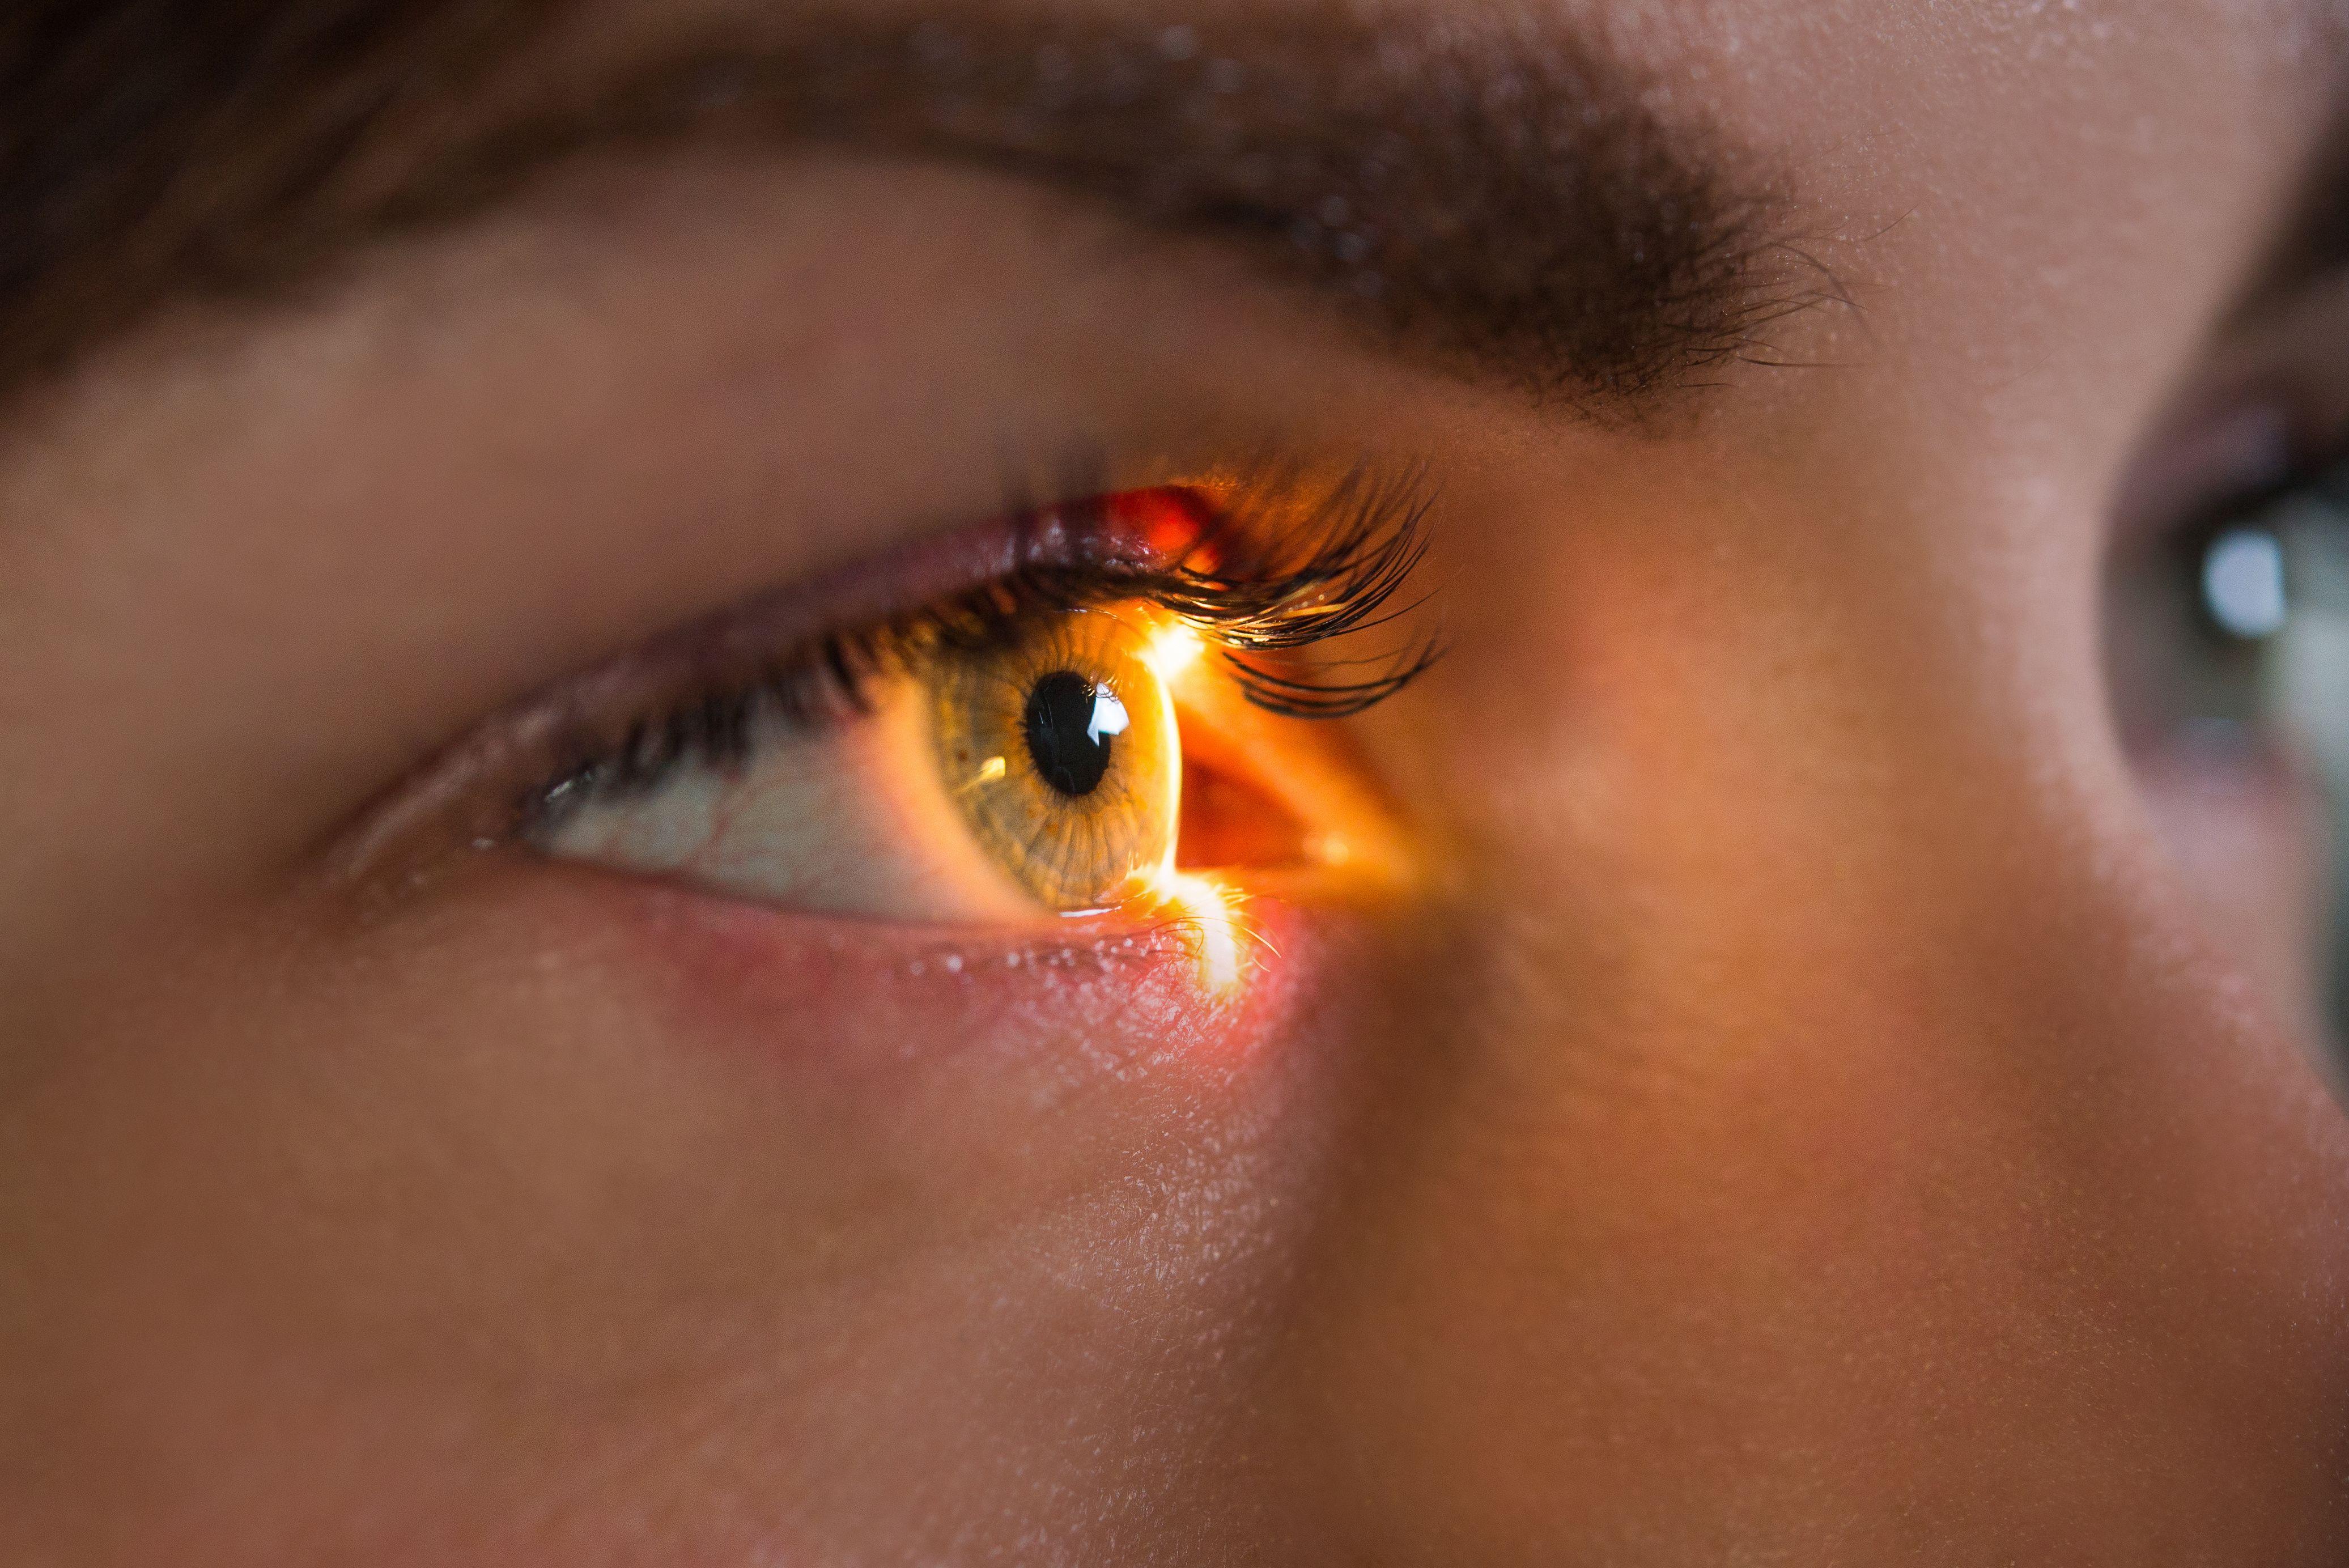 Status of glaucoma: diagnostics and treatments in flux